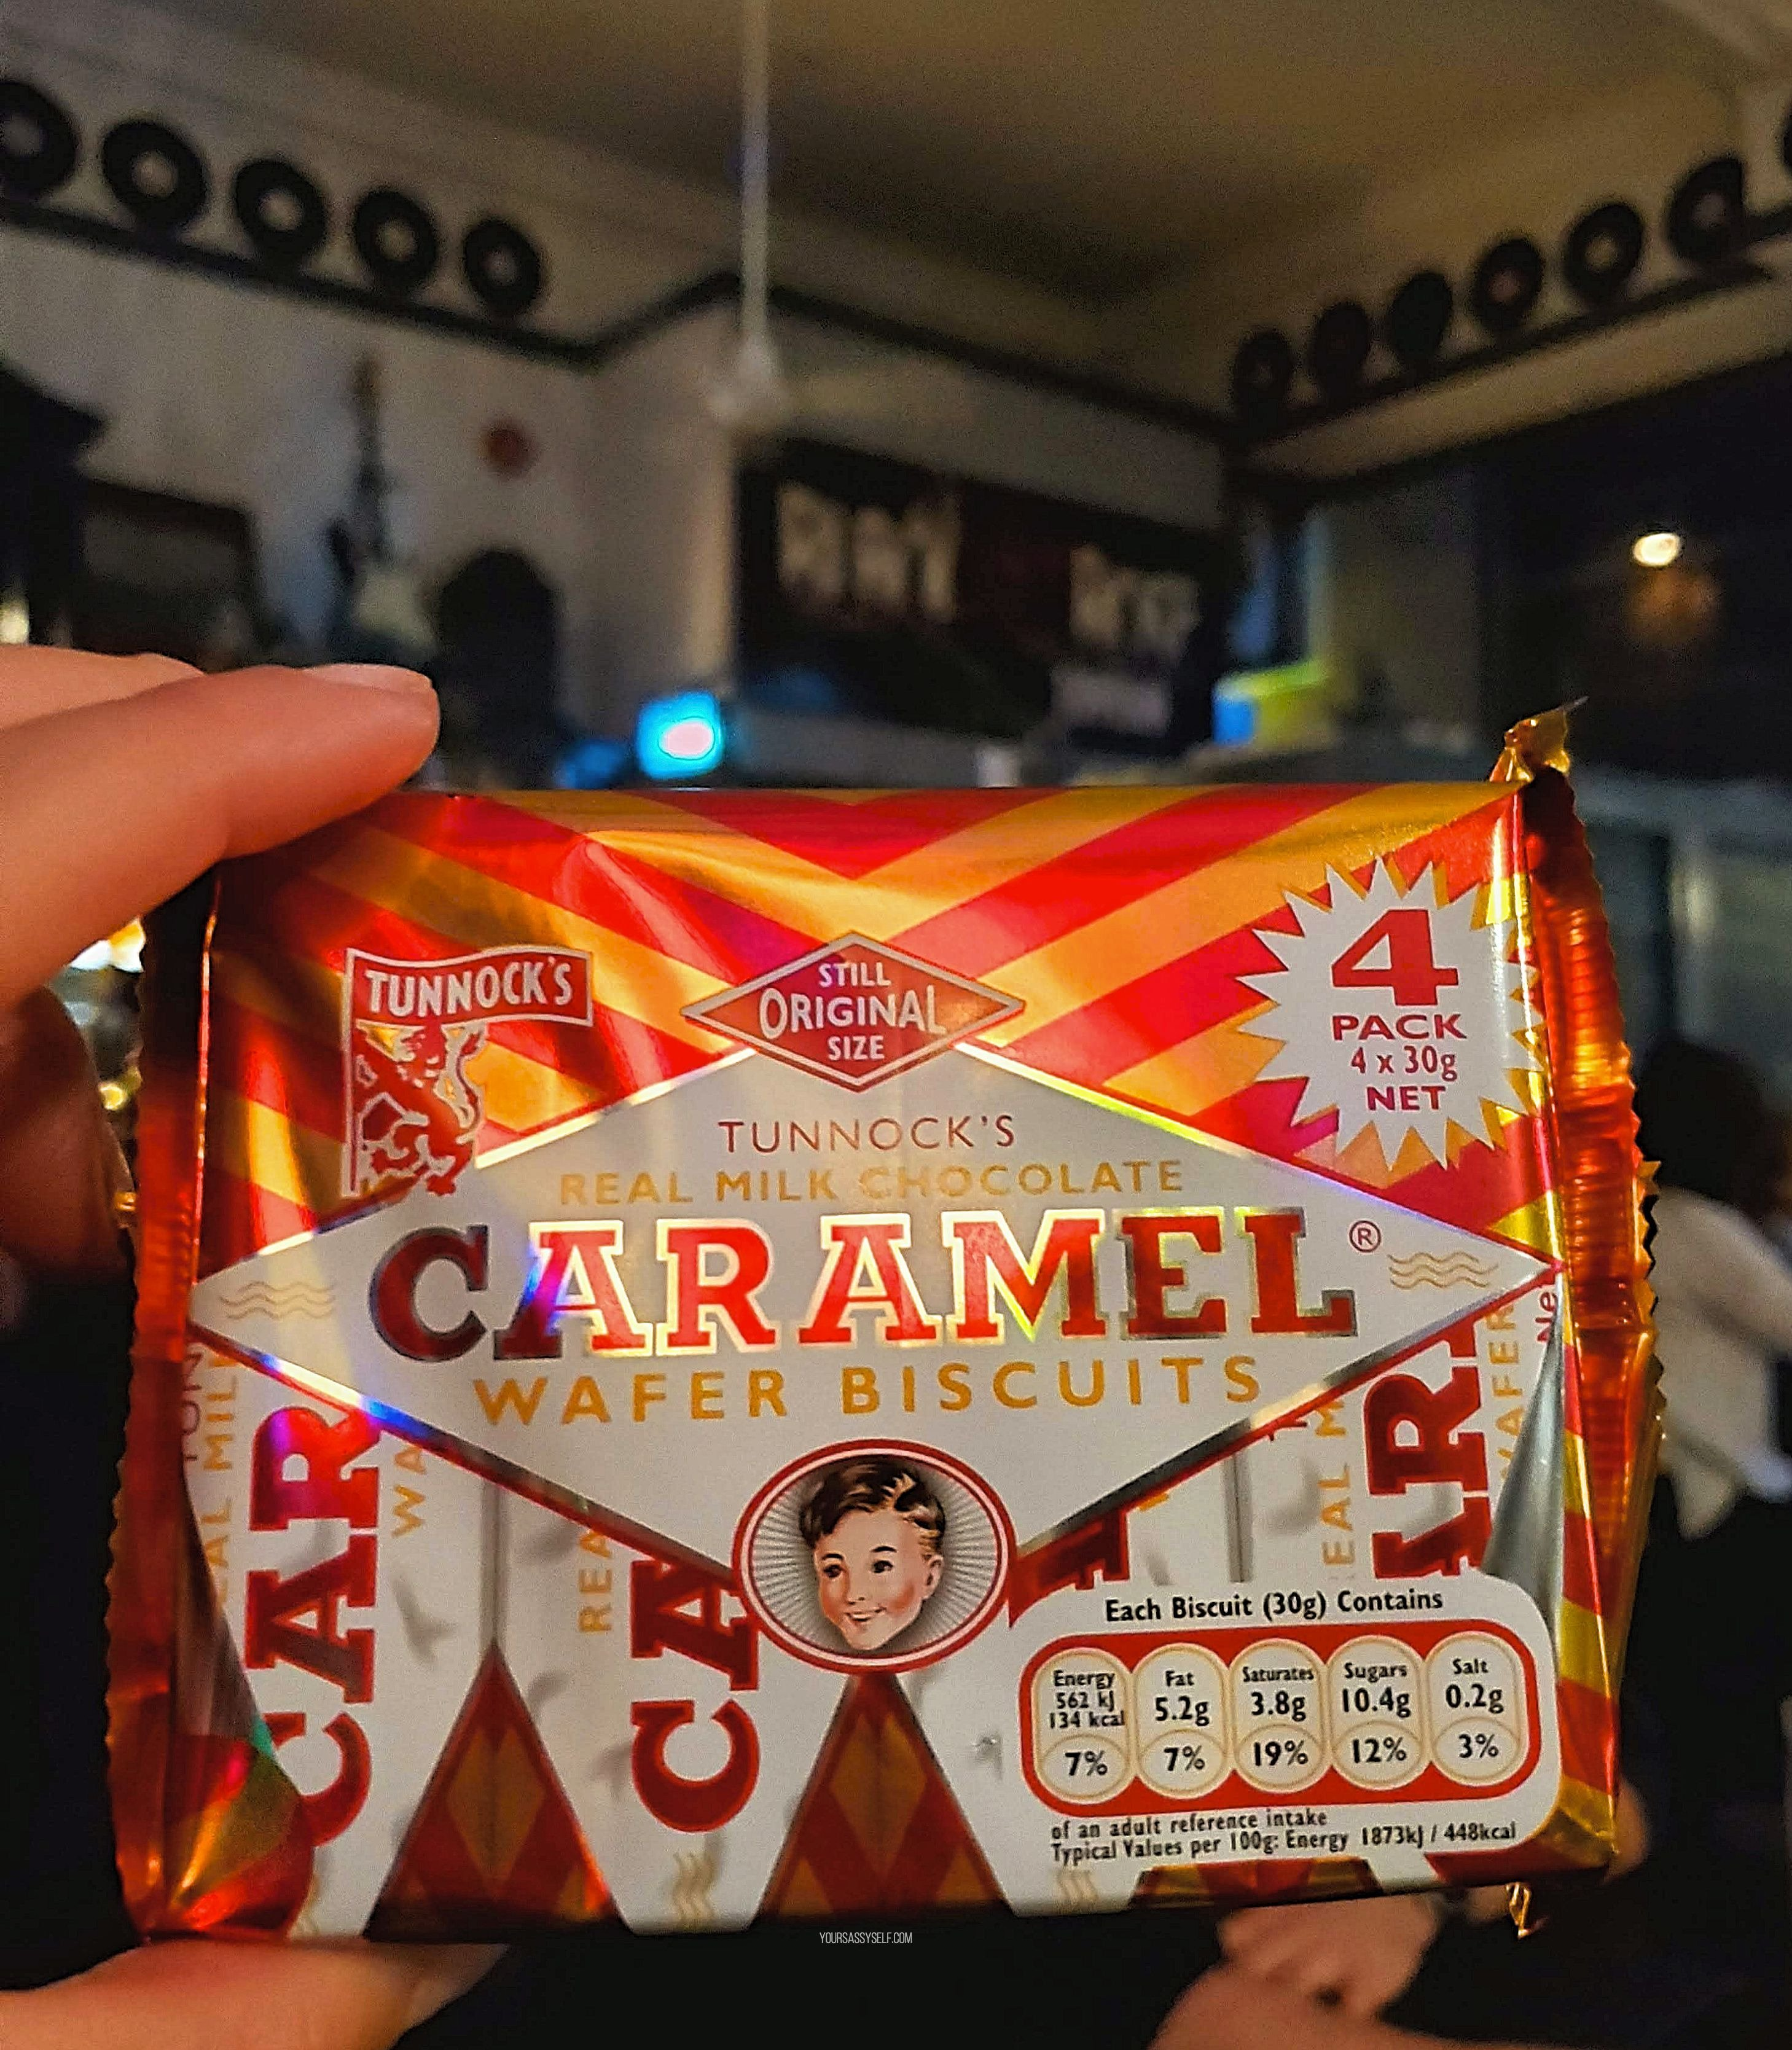 Caramel Wafer Biscuits - yoursassyself.com